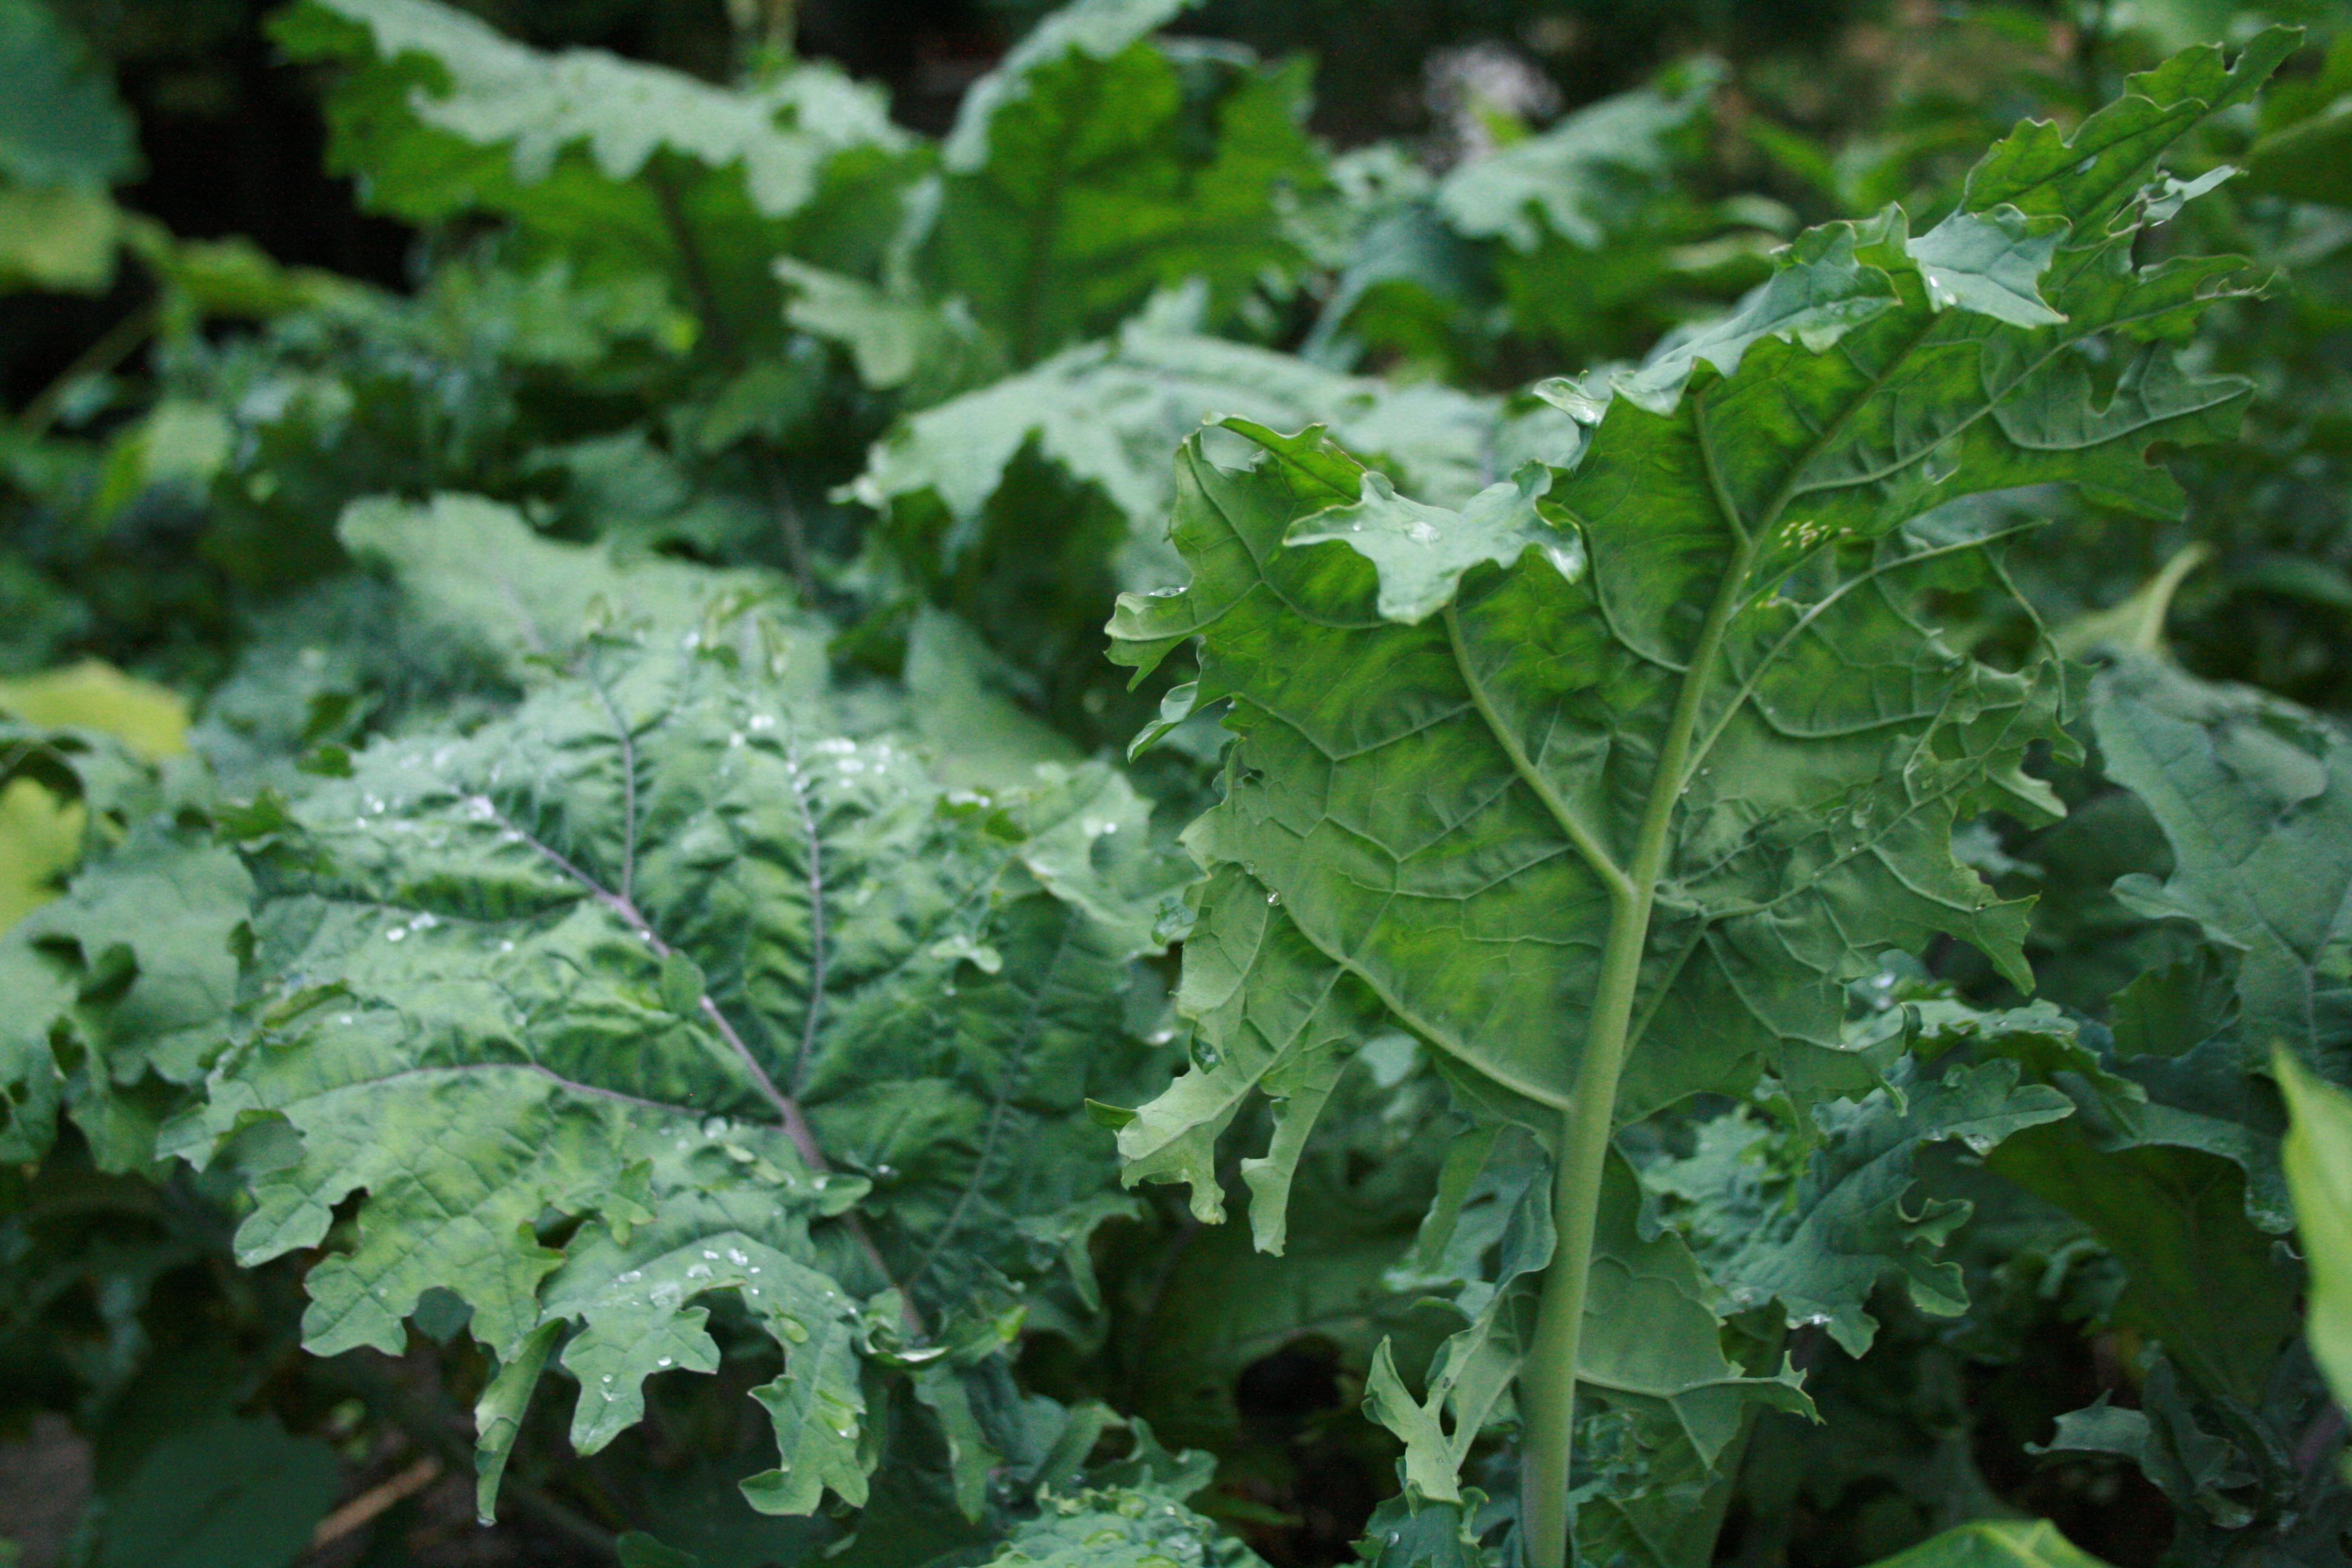 Dark Leafy Greens The Super Food Of Superfoods Phoebe